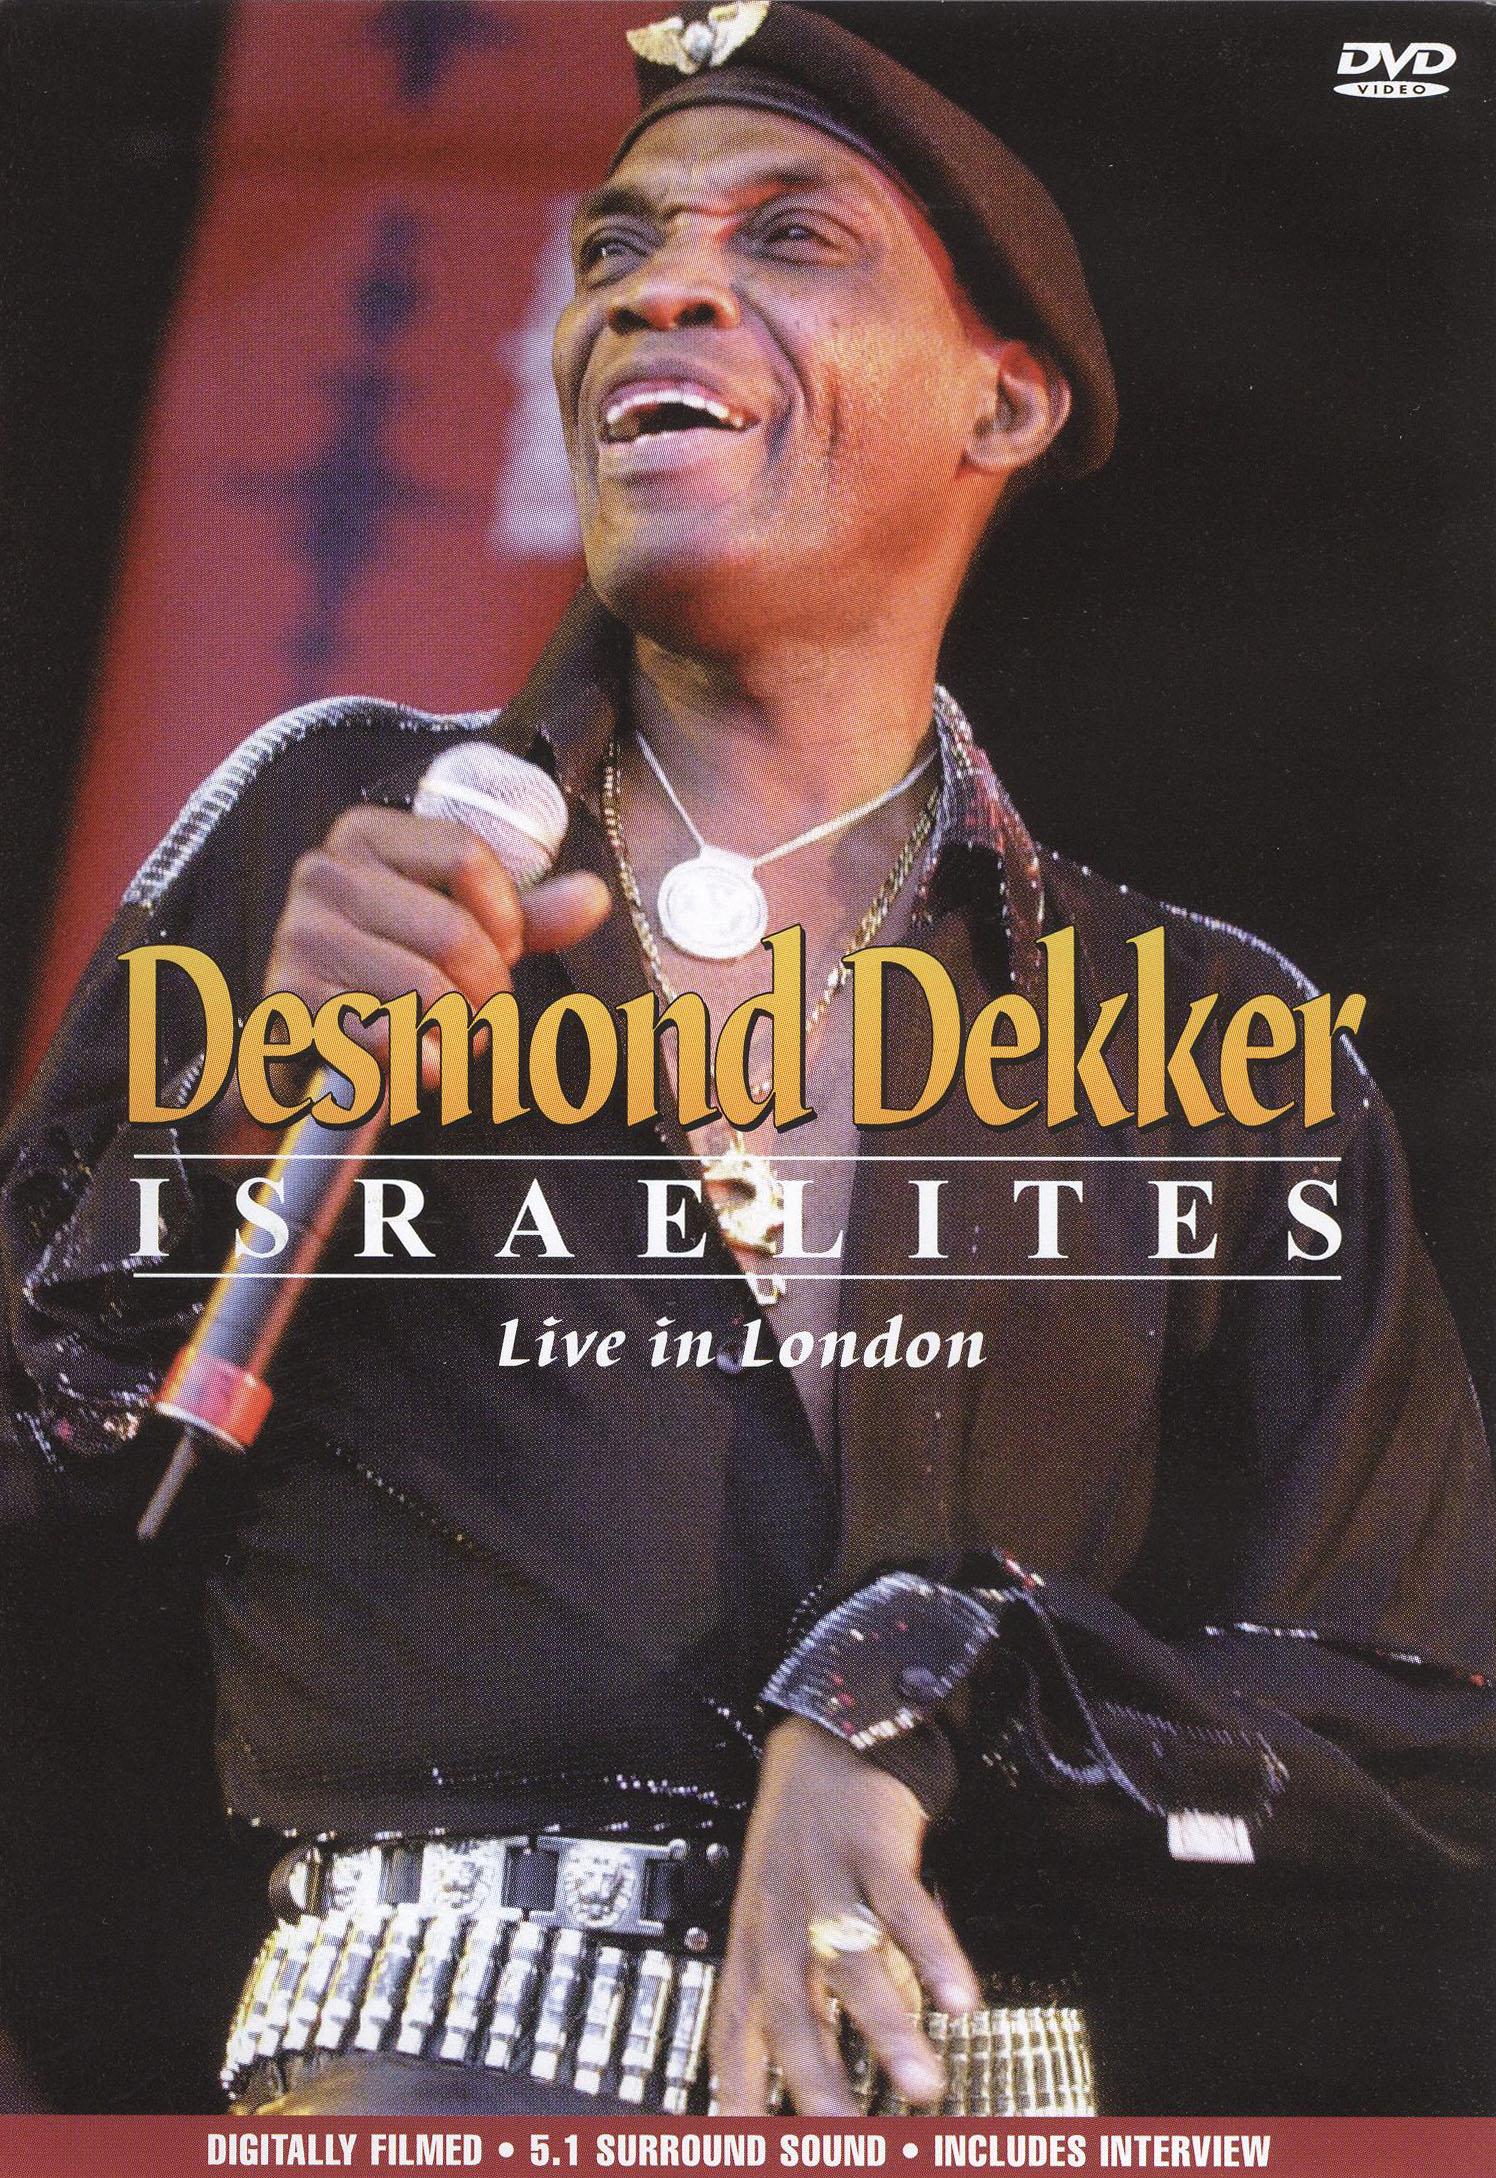 Desmond Dekker: Israelites - Live in London